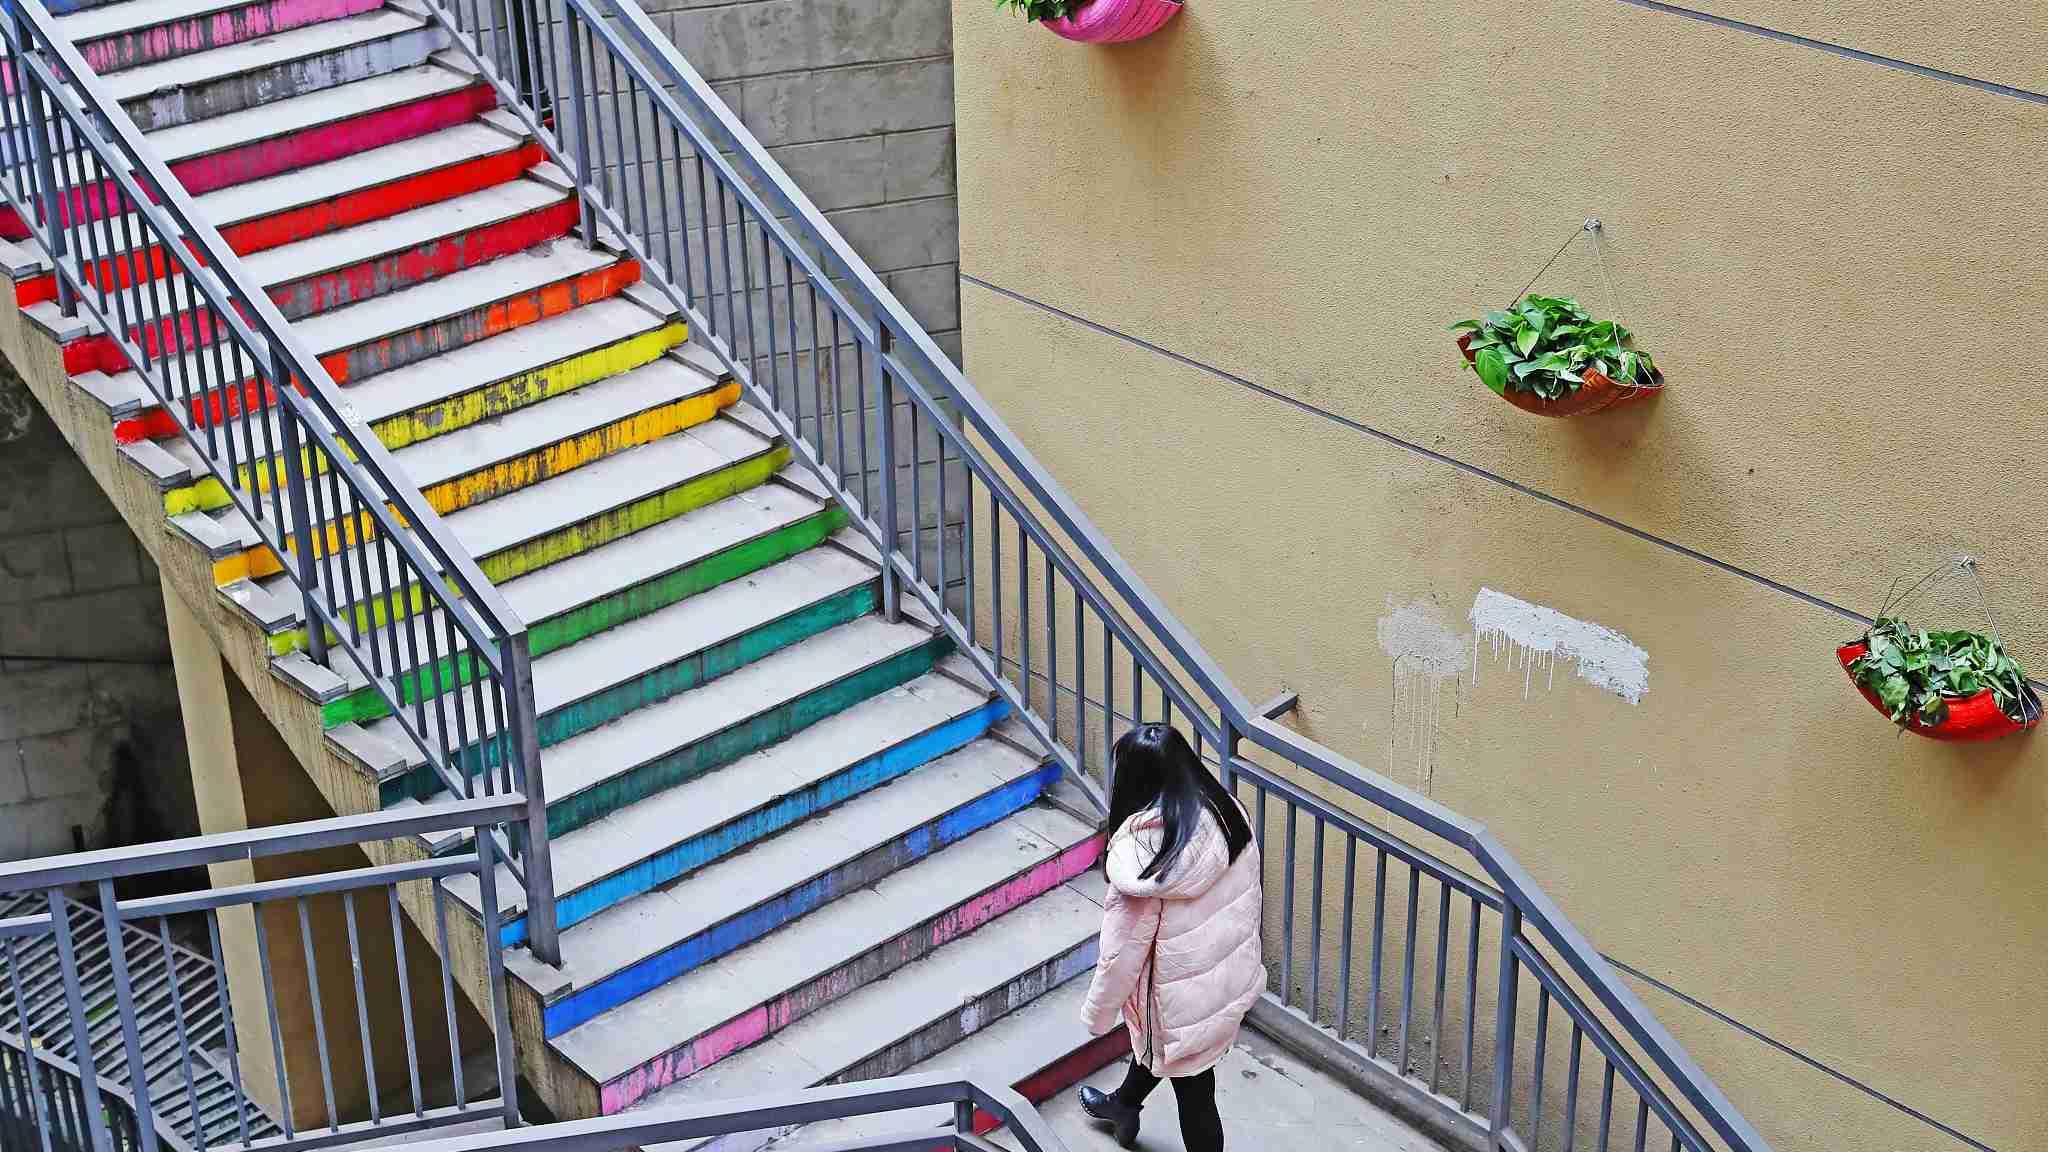 Old neighborhood in Chongqing turned into themed courtyard